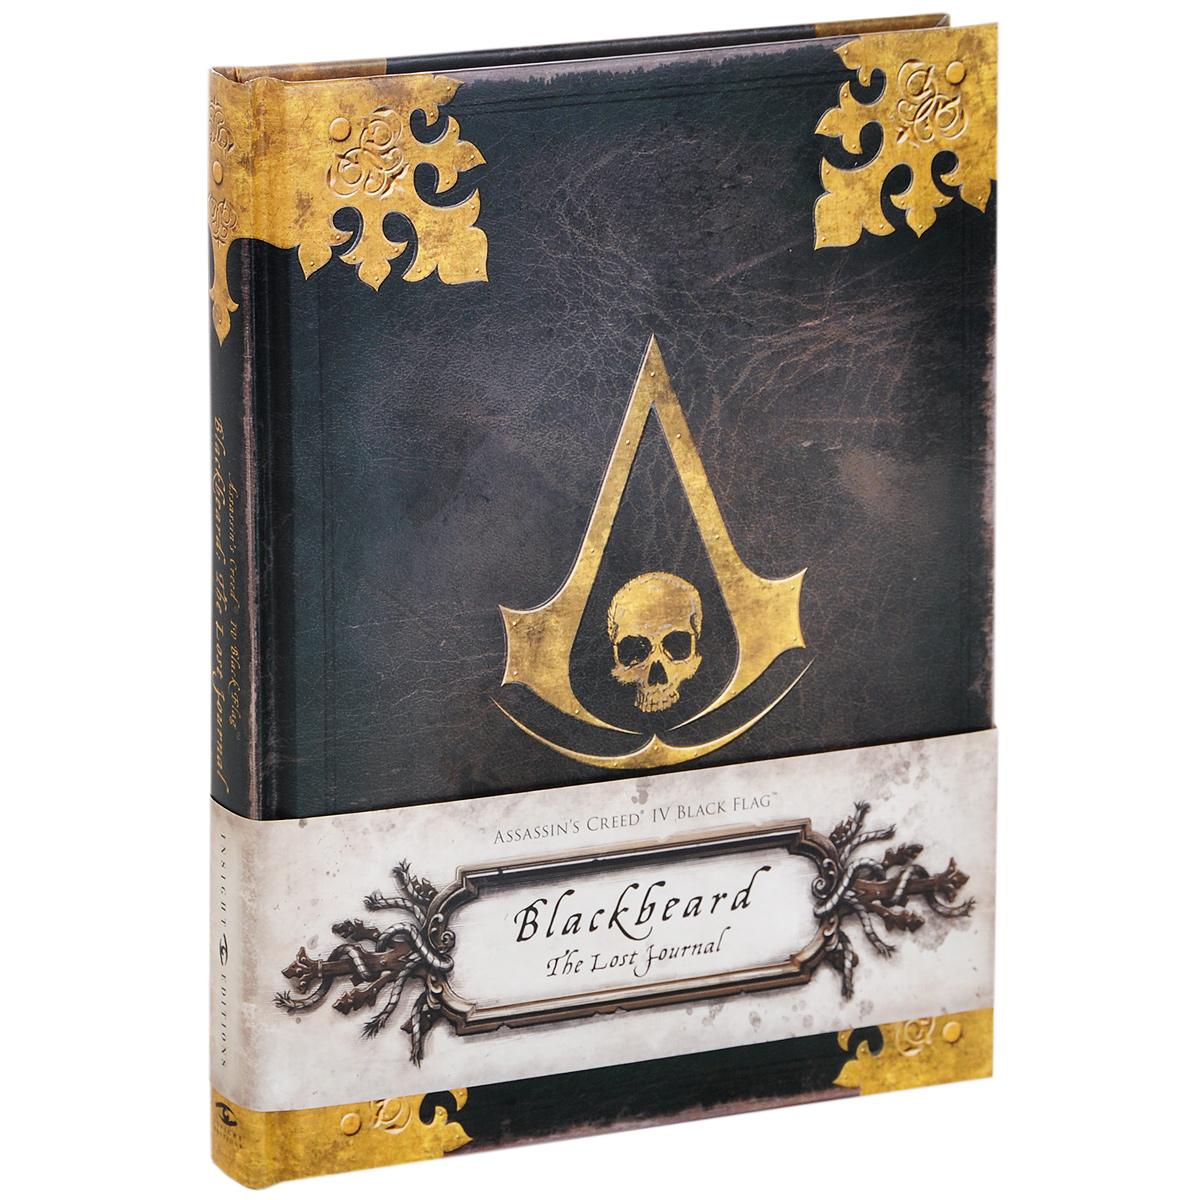 Assassins Creed IV Black Flag: Blackbeard: The Lost Journal